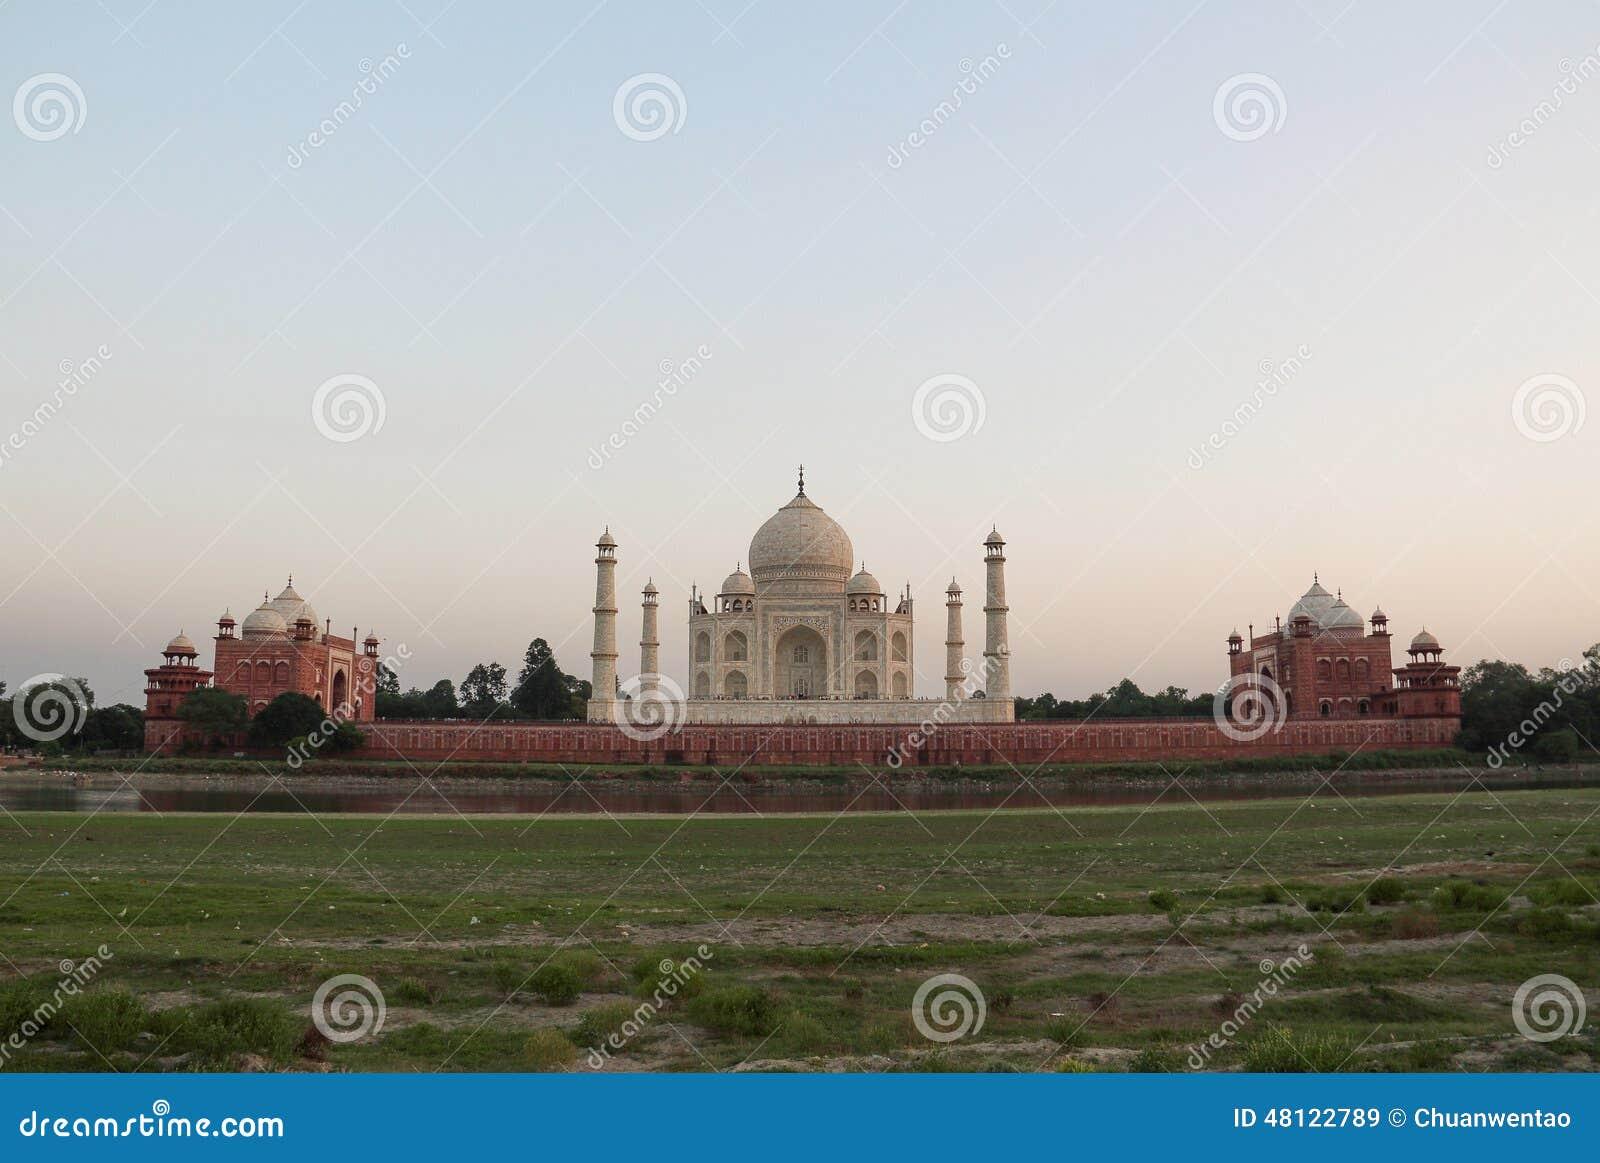 La parte posterior del Taj Mahal en la puesta del sol